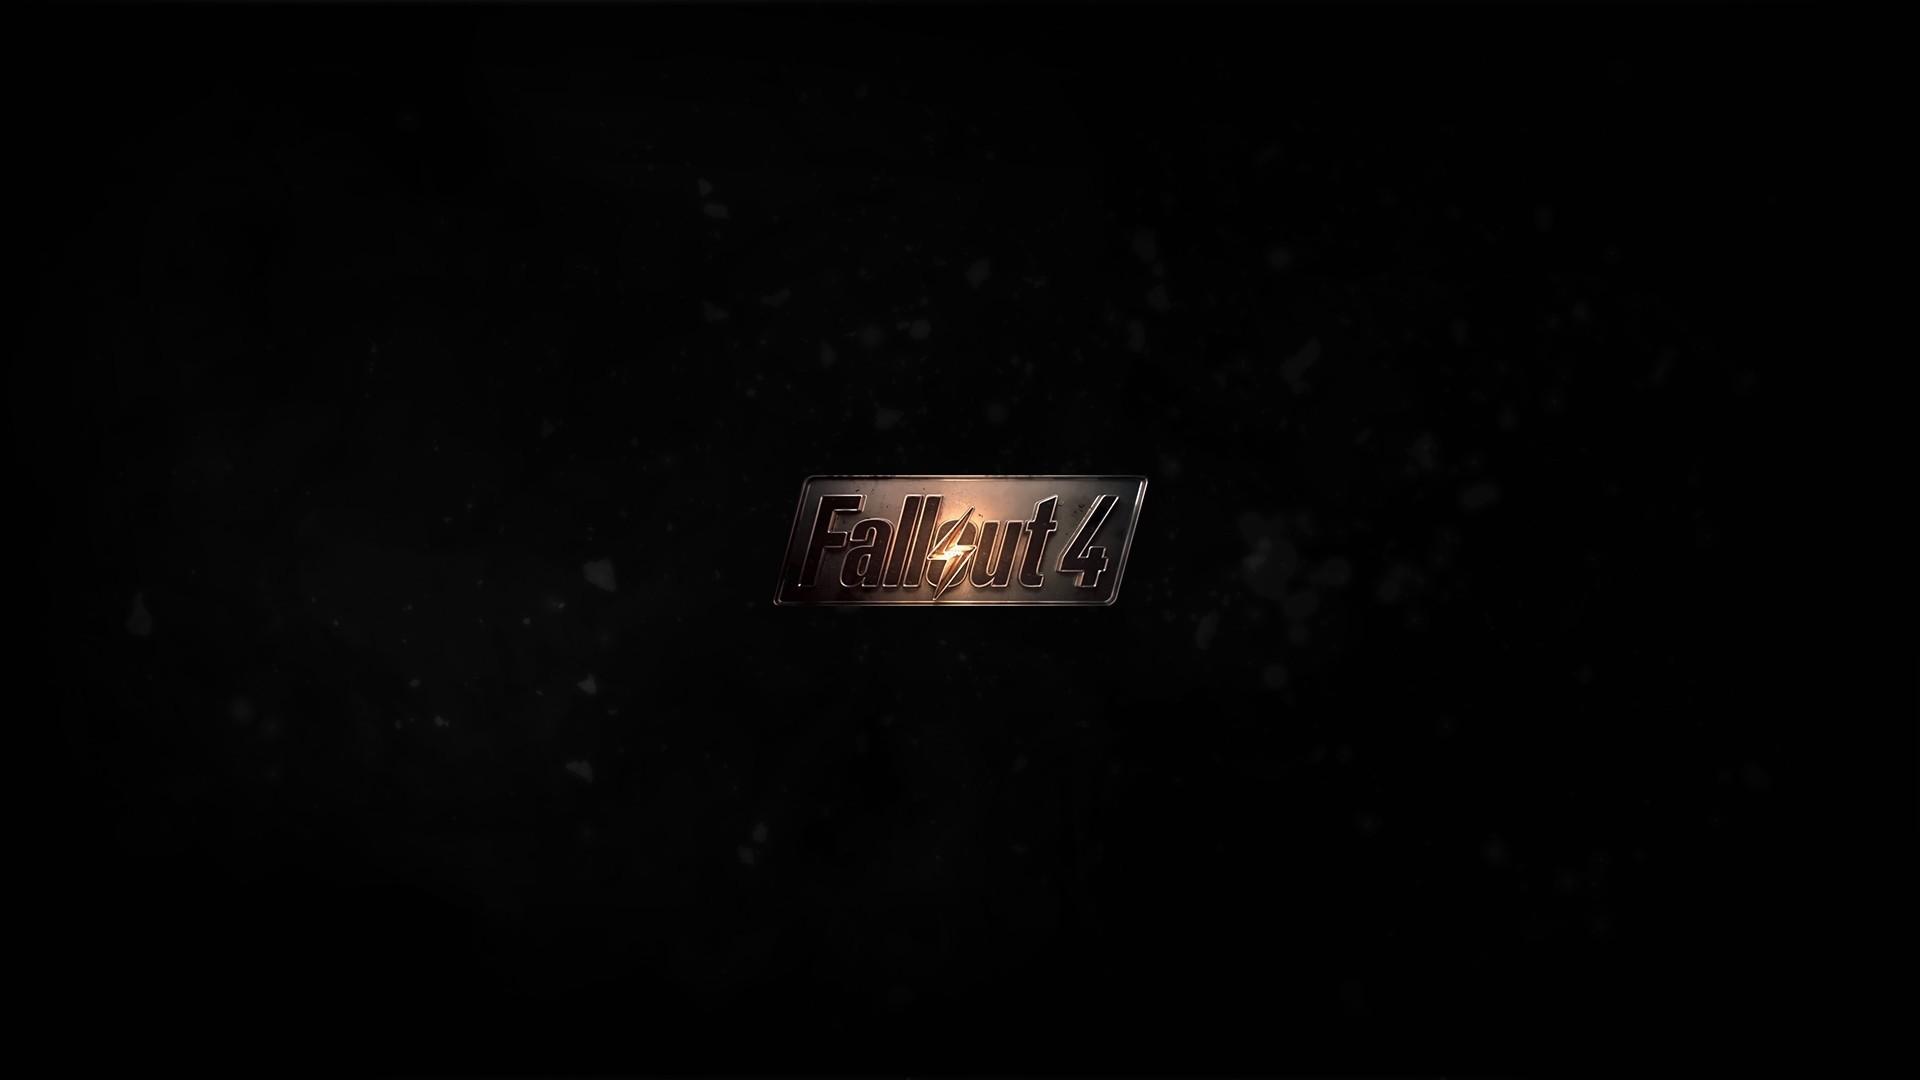 Fallout 4 Game Logo